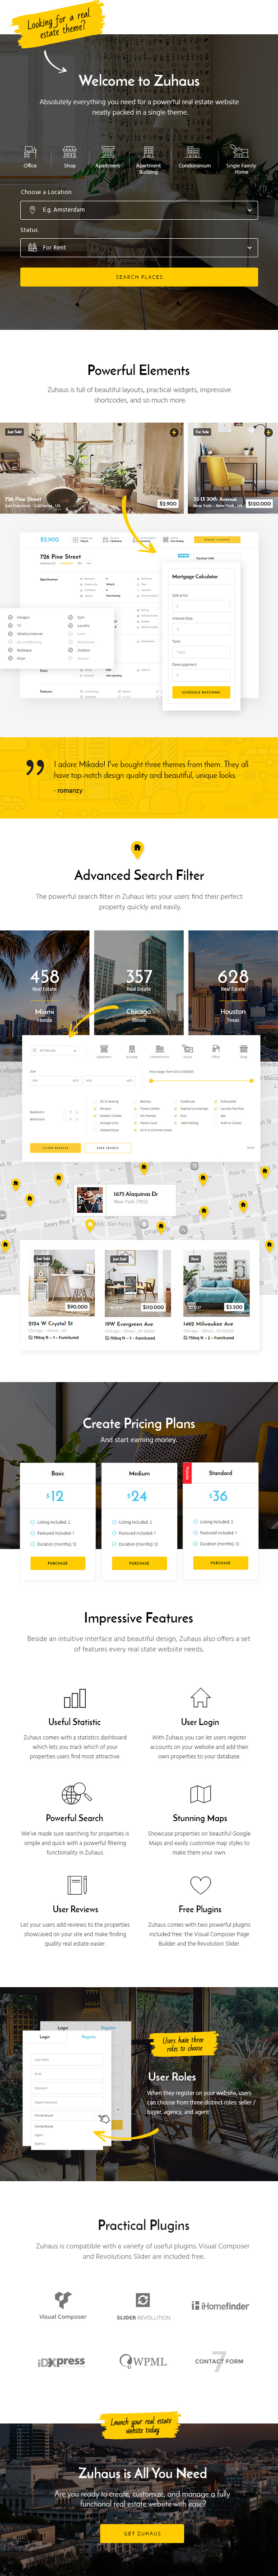 WordPress theme Zuhaus - A Modern Real Estate and Rental Theme (Real Estate)